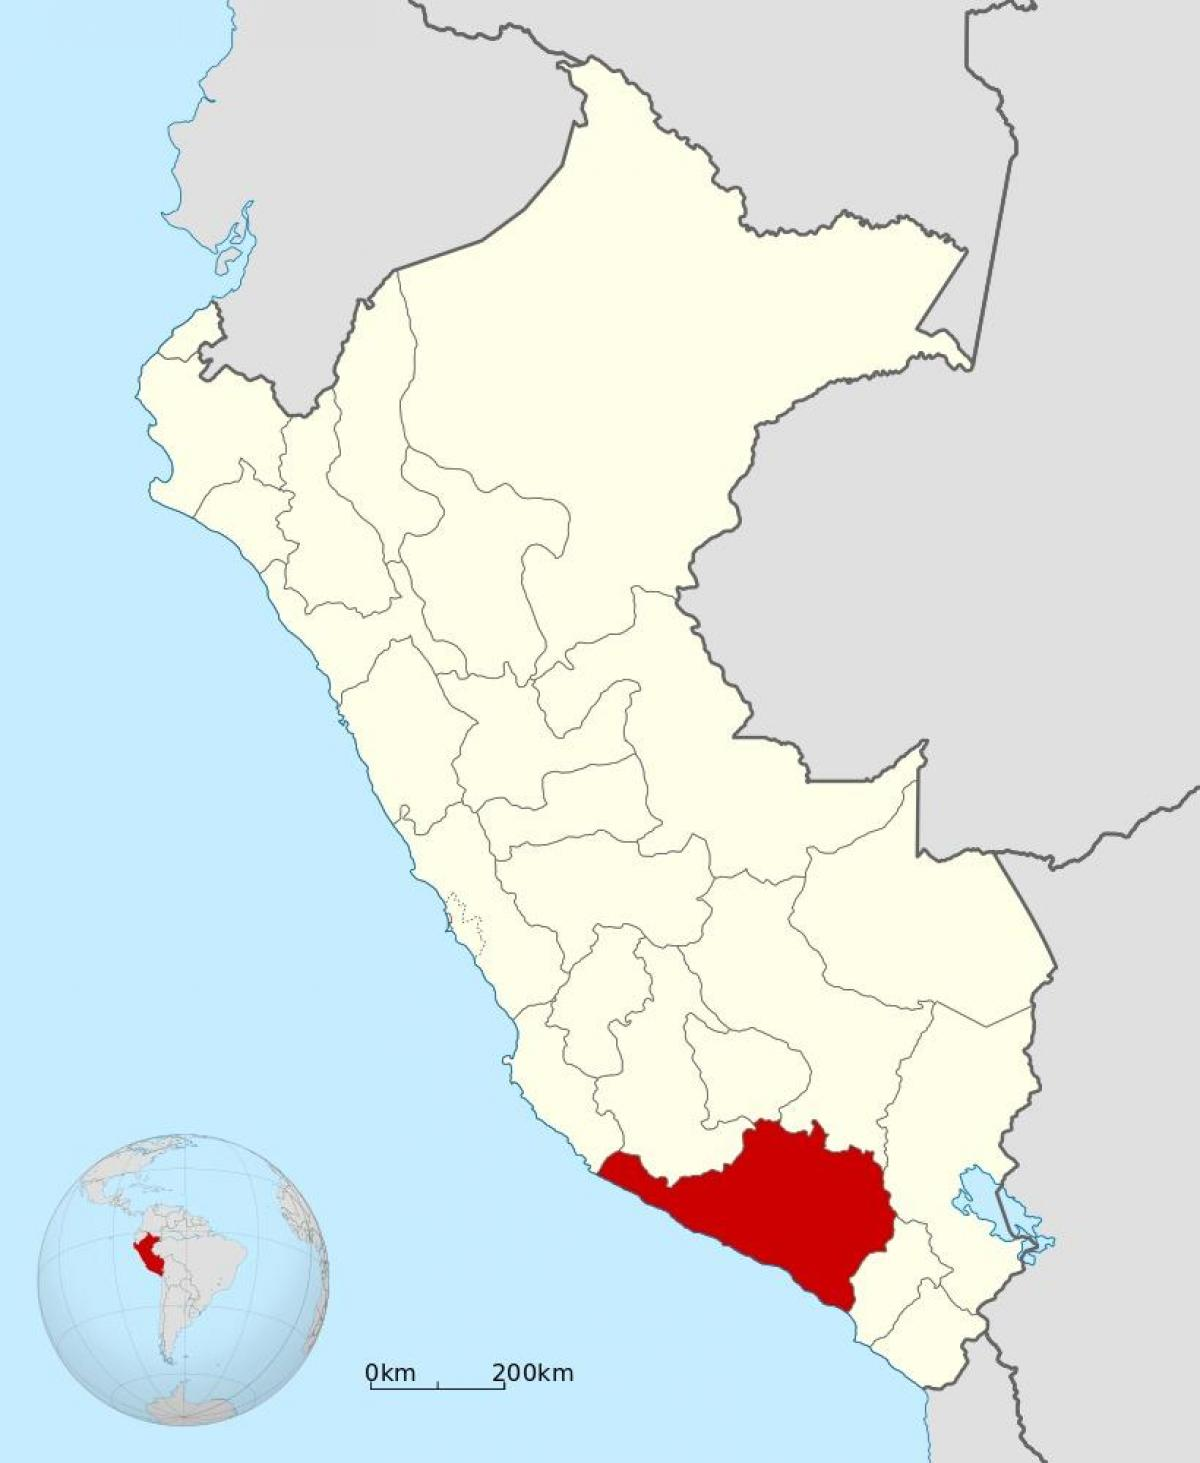 Arequipa Peru Kartta Kartta Arequipa Peru Etela Amerikka